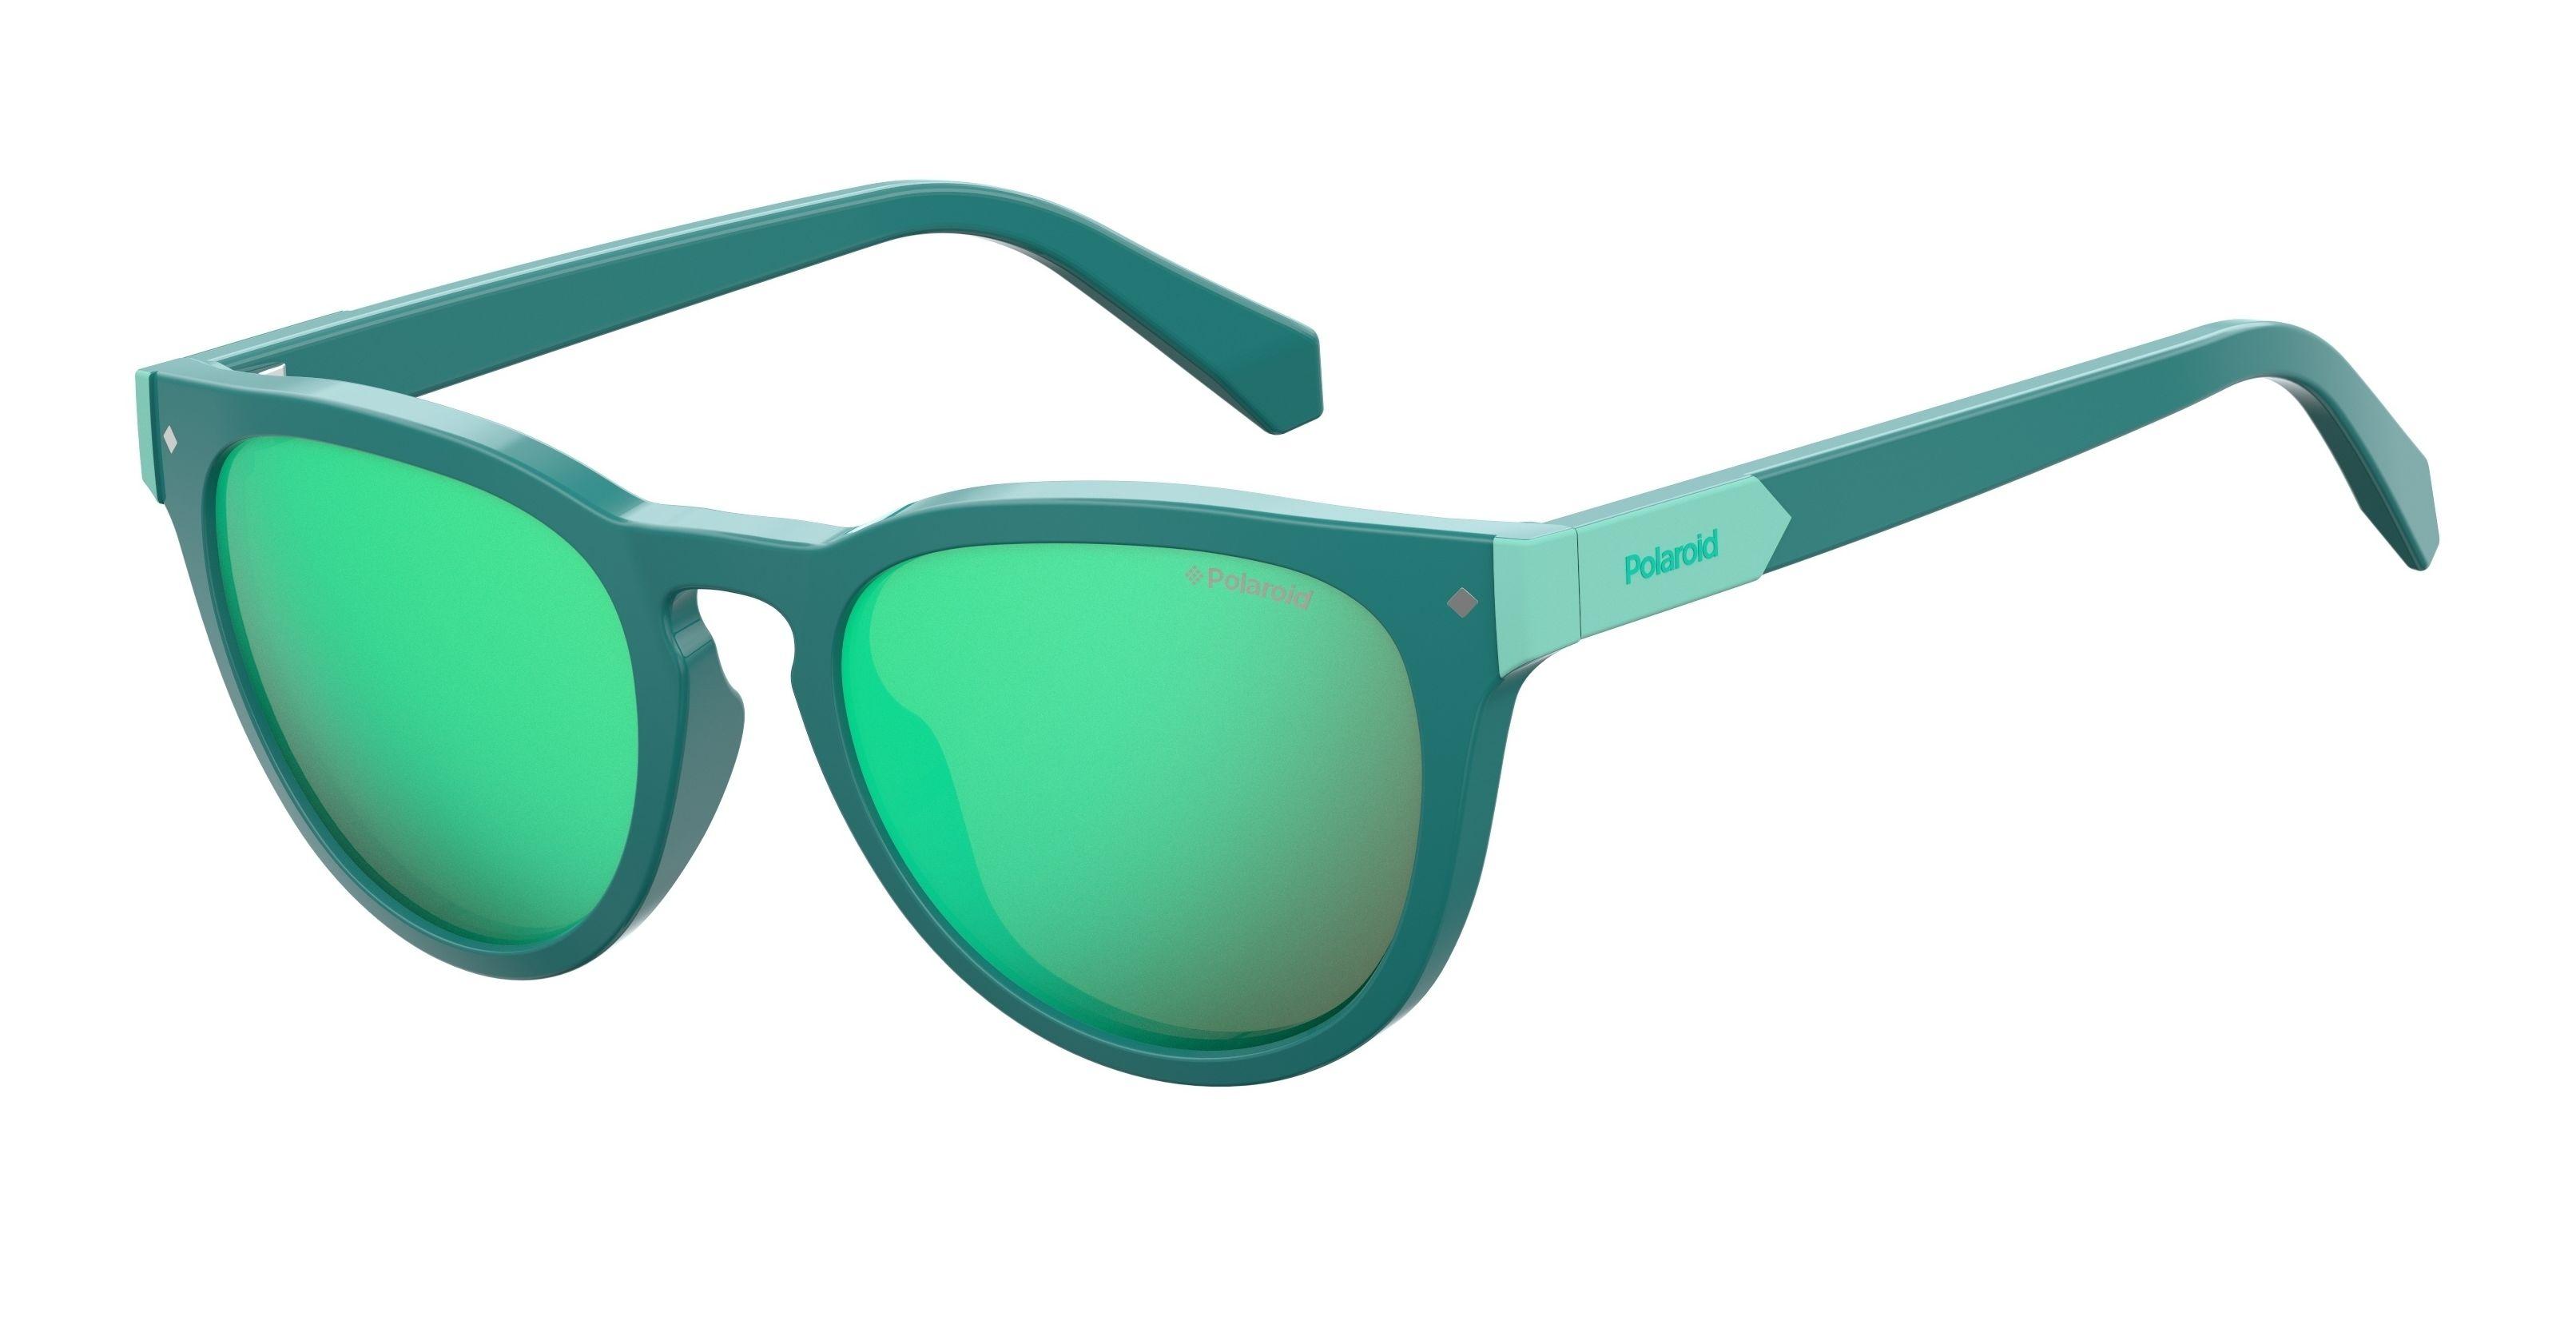 5a434582a0 Eyewear for Kids - Green - Optiwow